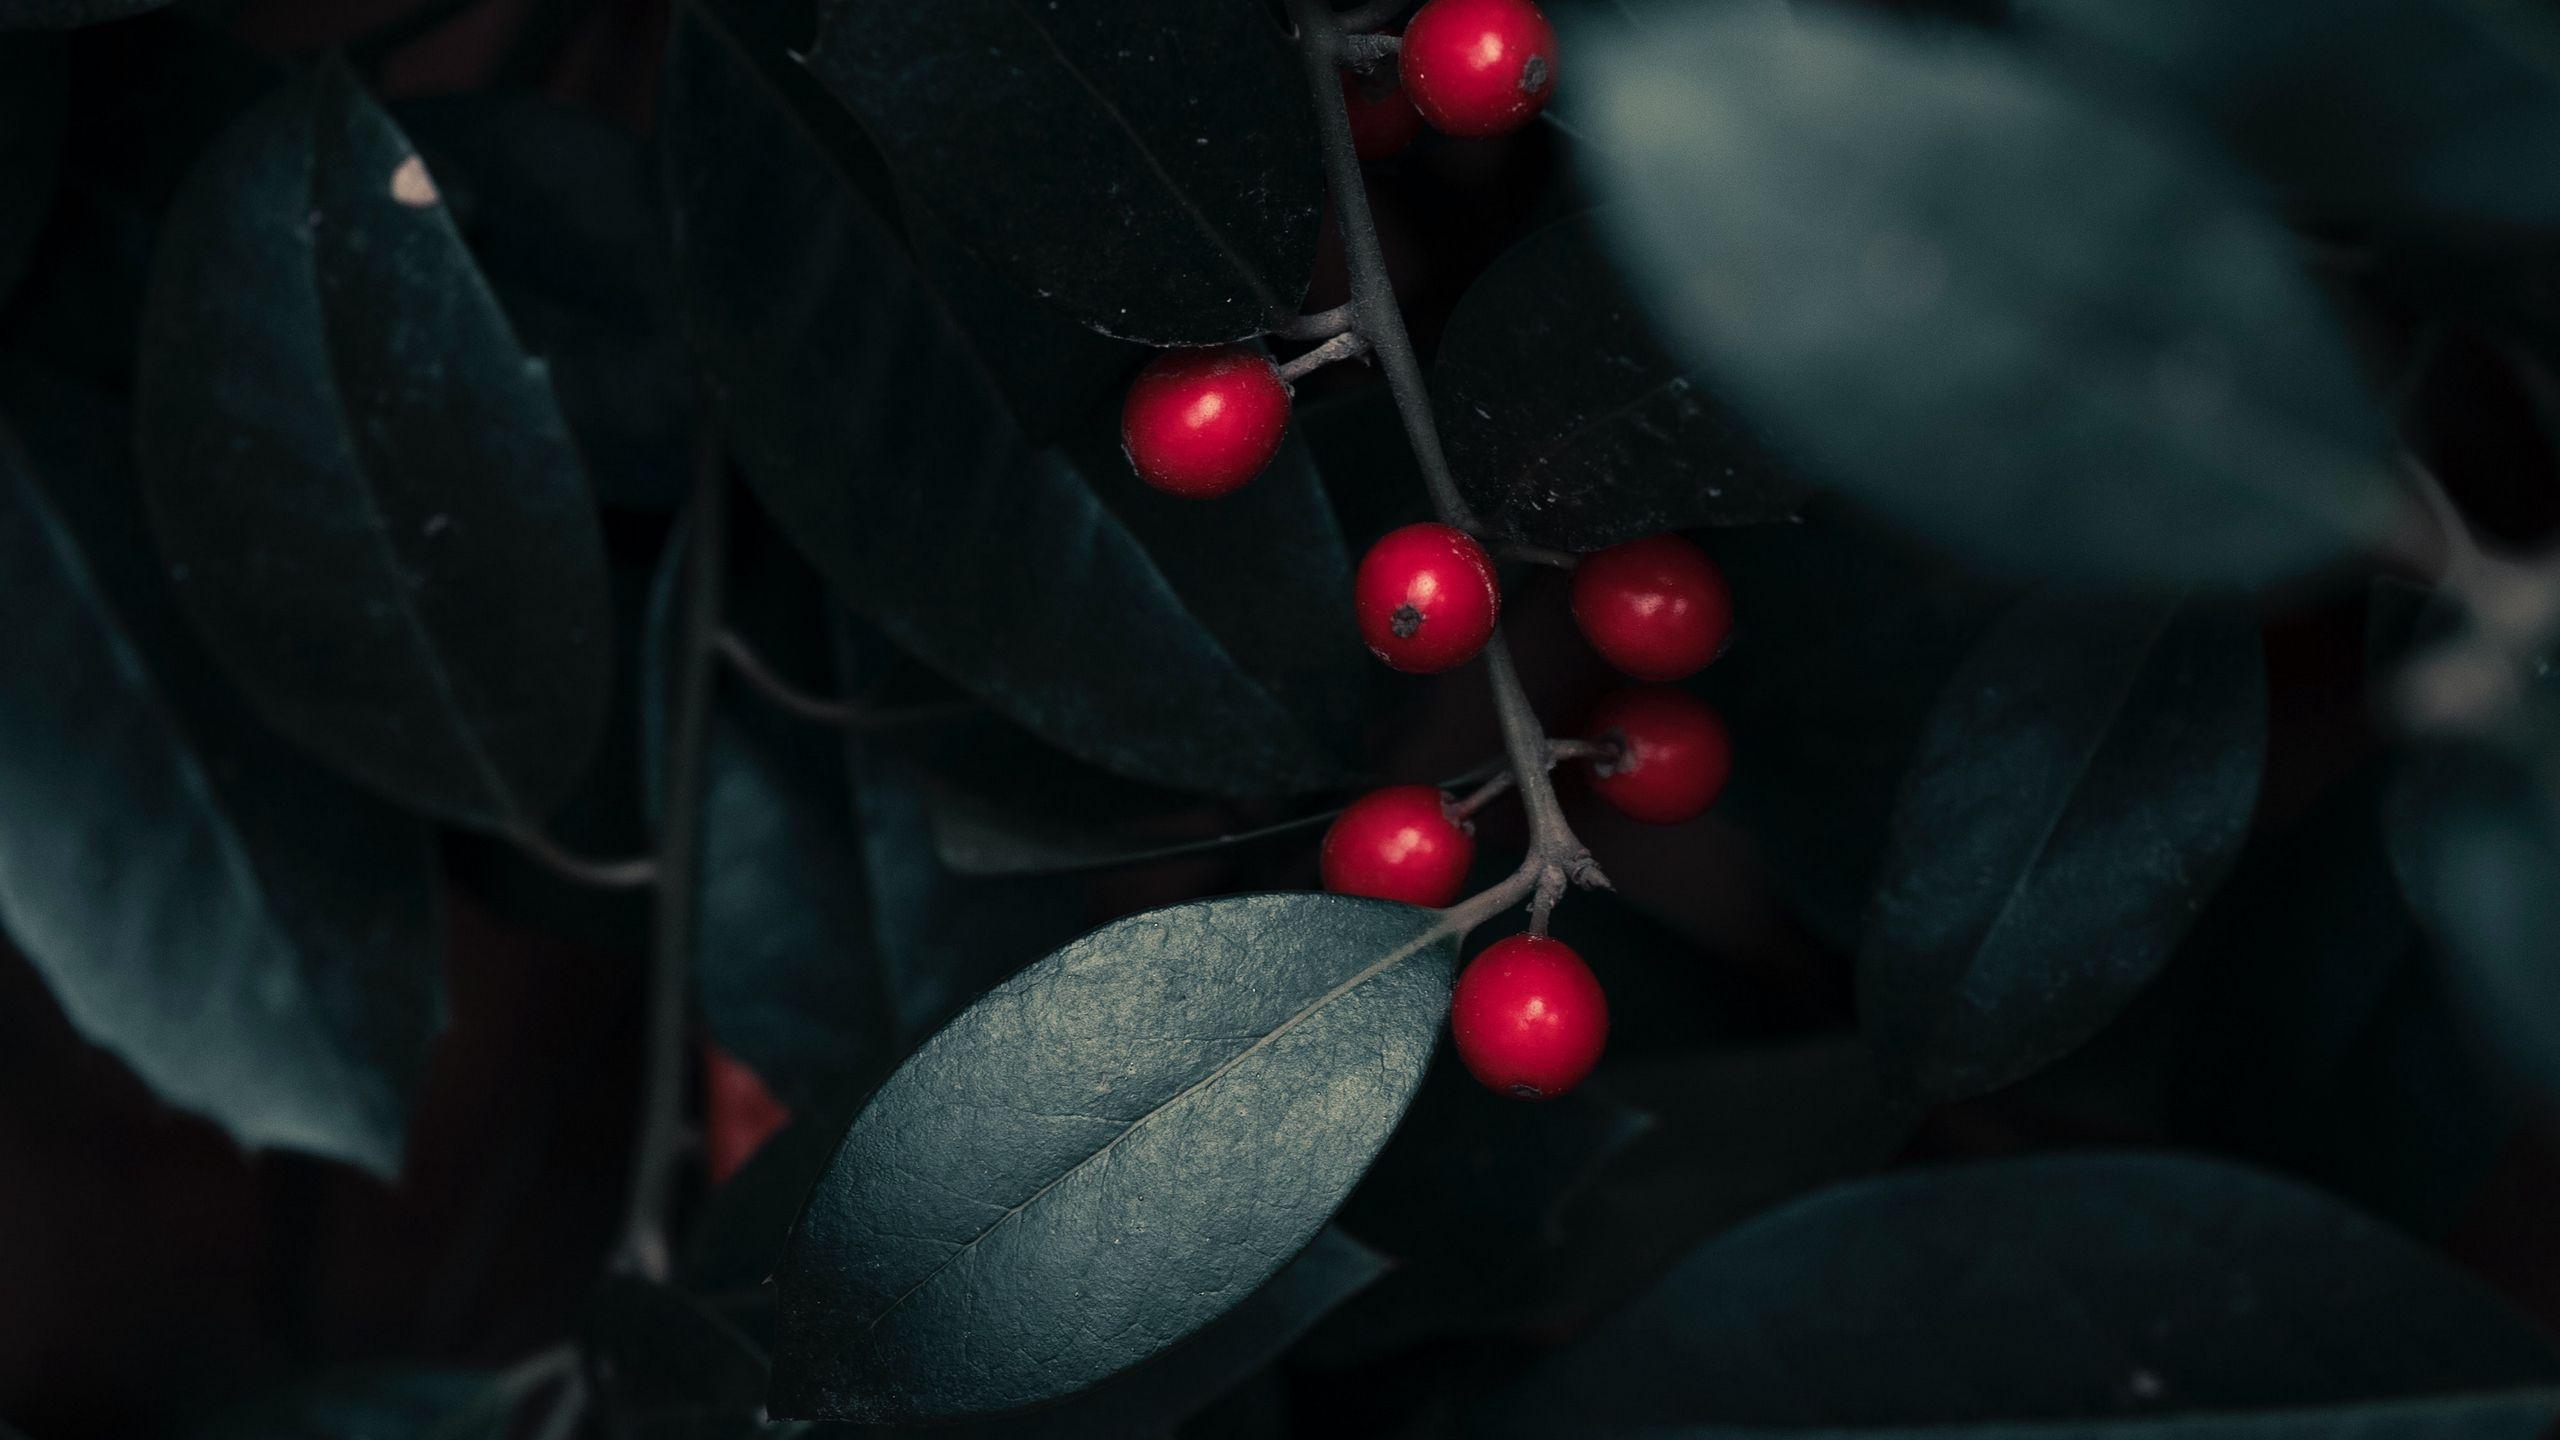 Berries On A Branch wallpaper hd